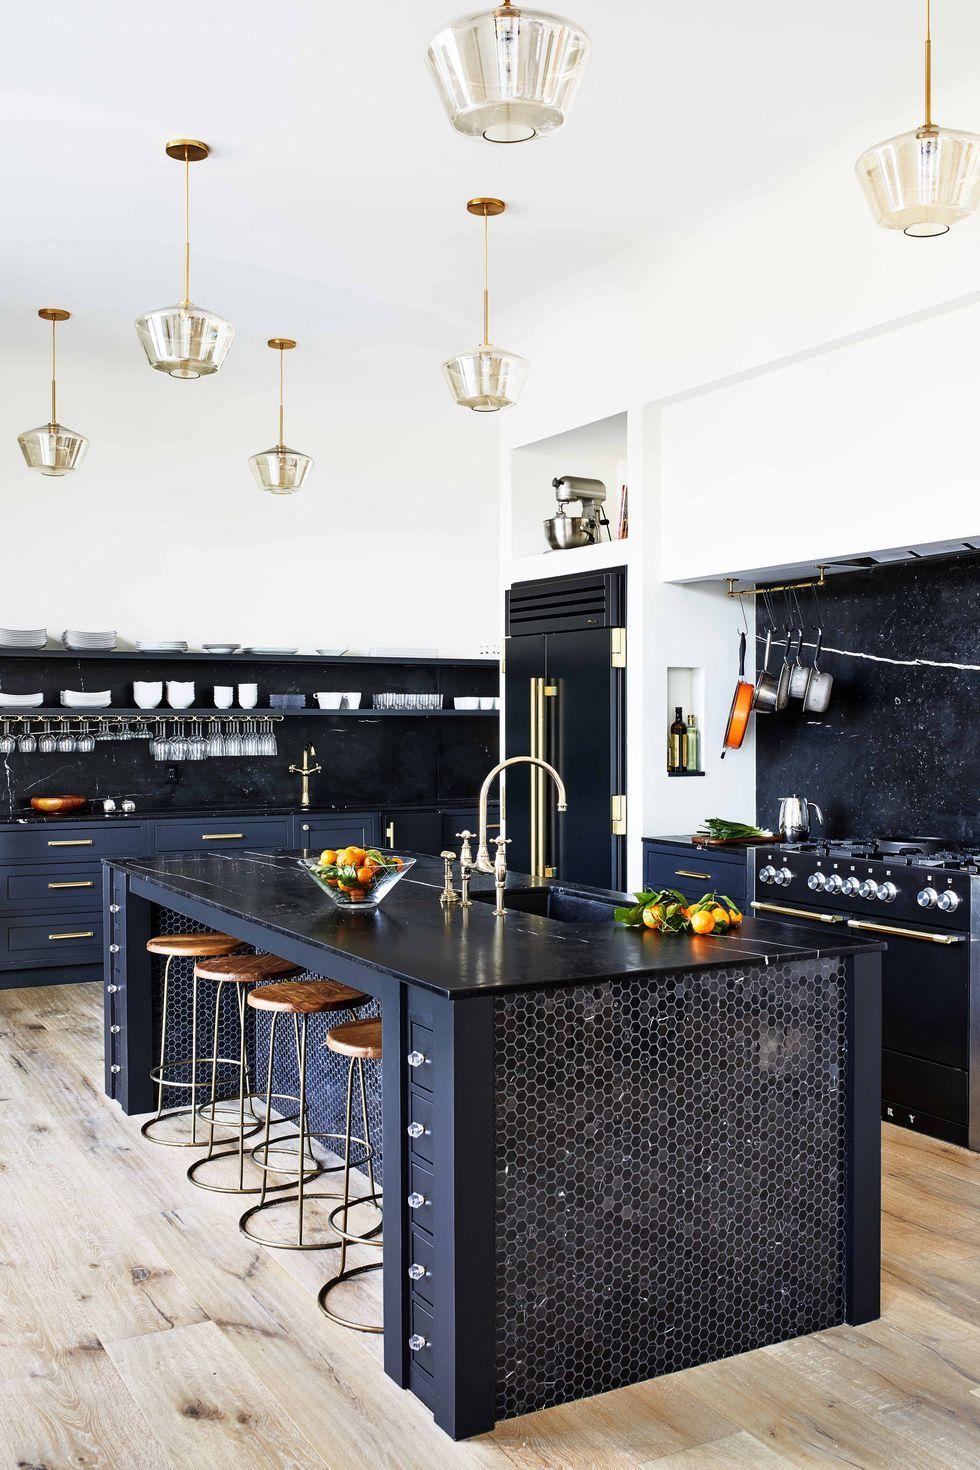 Image of: 60 Gorgeous Kitchen Lighting Ideas Modern Light Fixtures